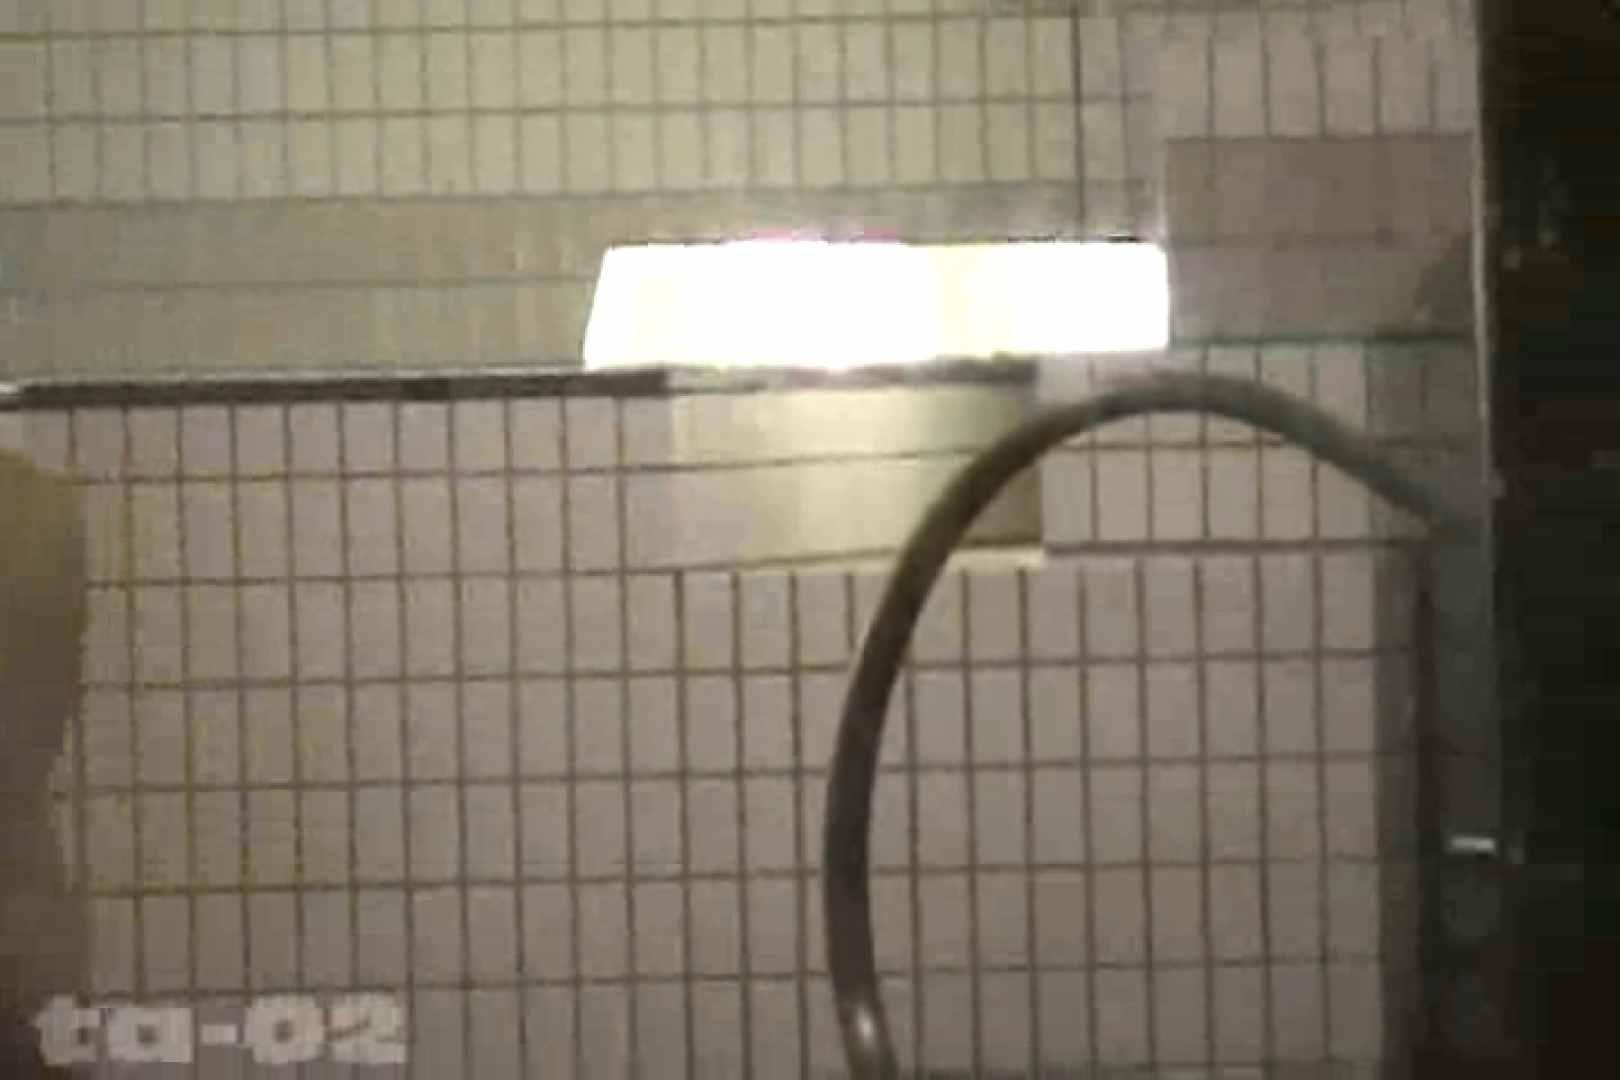 合宿ホテル女風呂盗撮高画質版 Vol.02 盗撮  81PIX 4